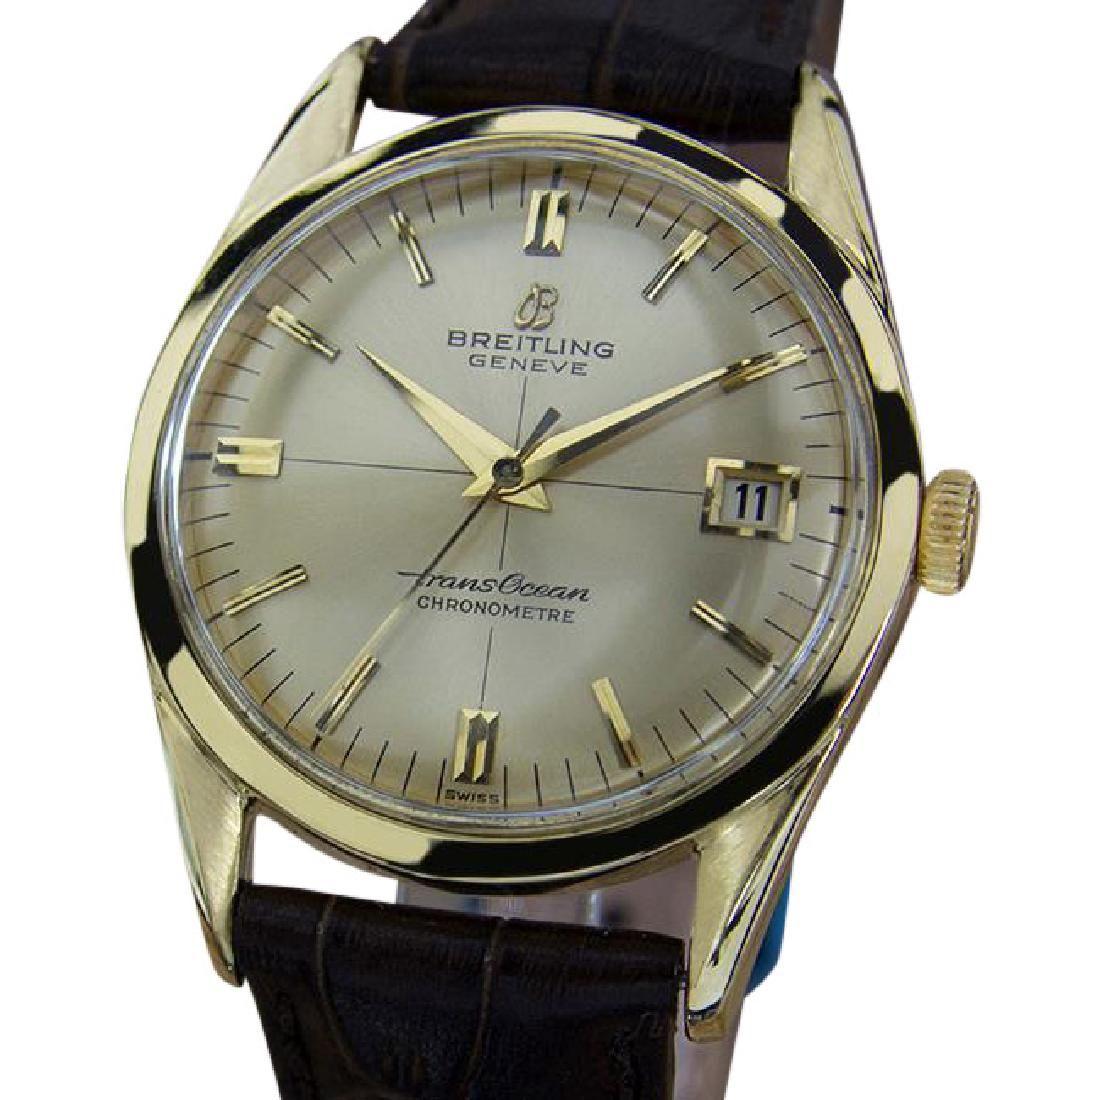 BREITLING | Trans Ocean Chronometre | 1960